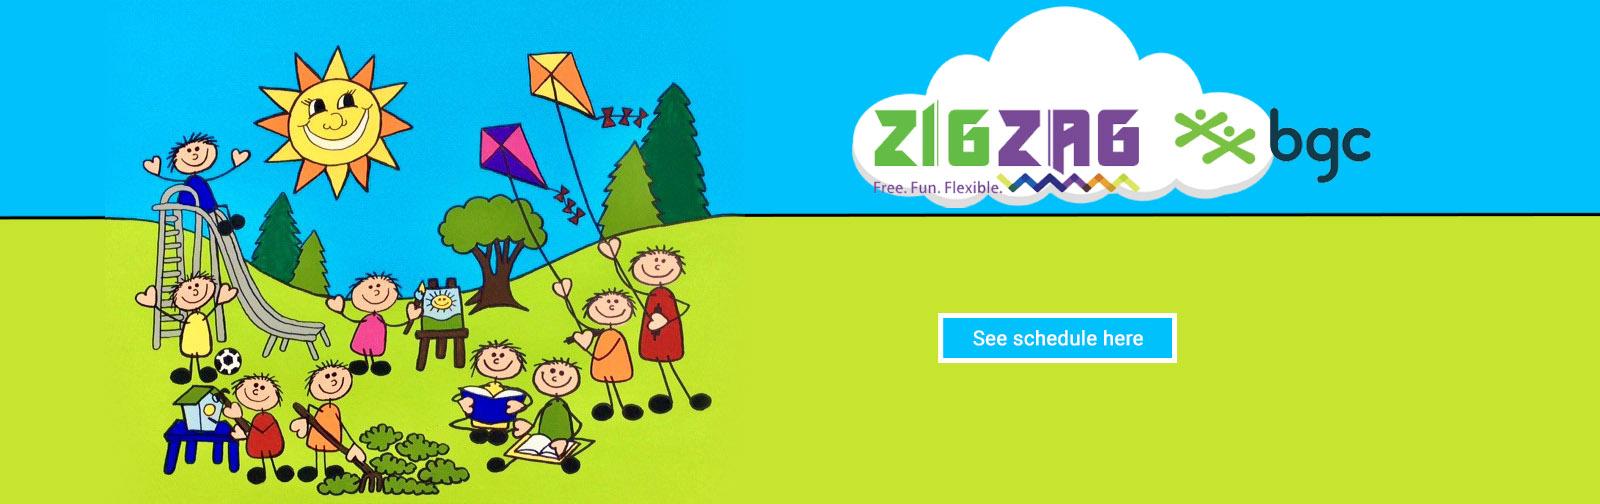 zigzag21web